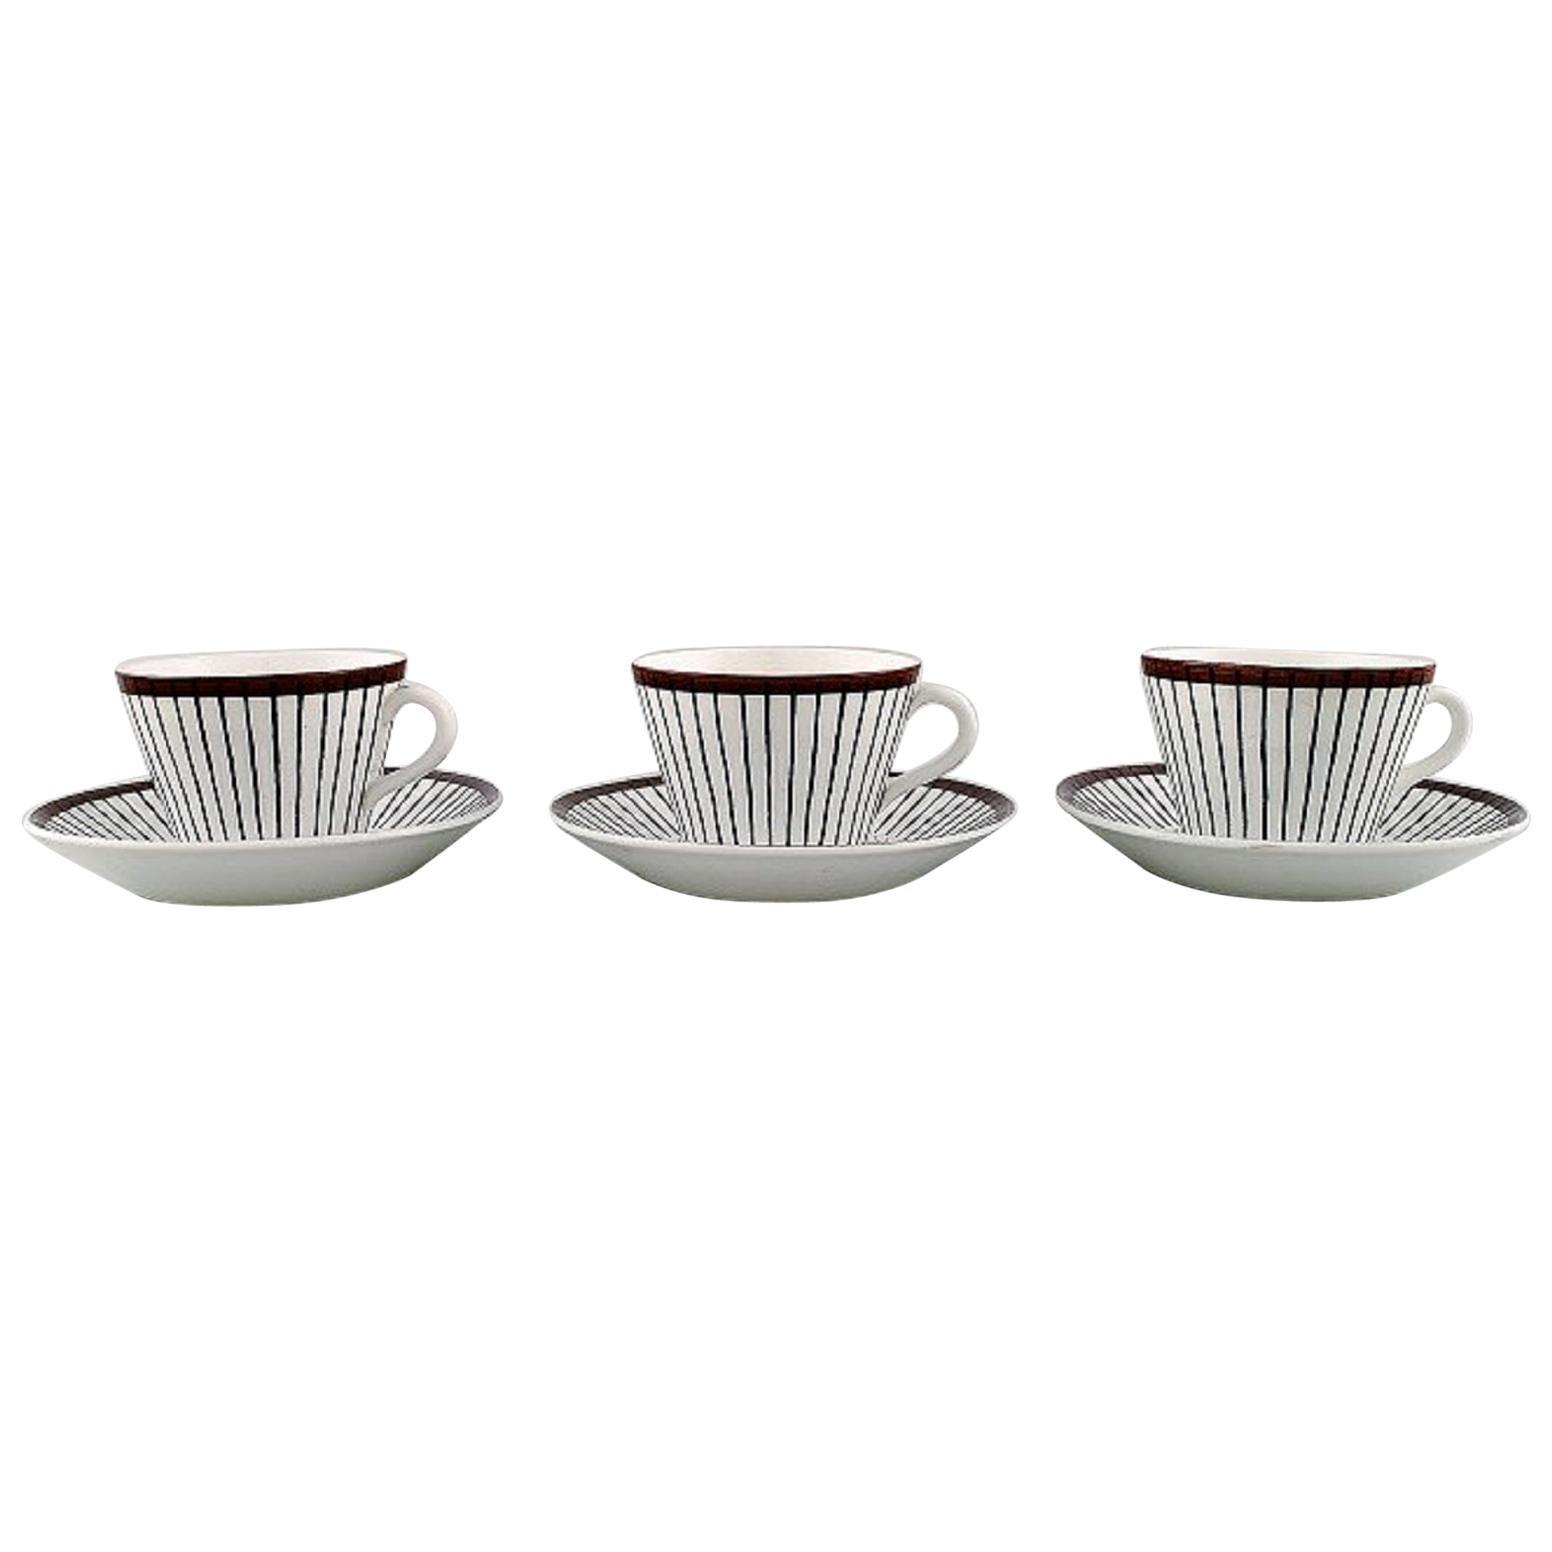 "Stig Lindberg for Gustavsberg, Three ""Spisa Ribb"" Coffee Cups with Saucers"